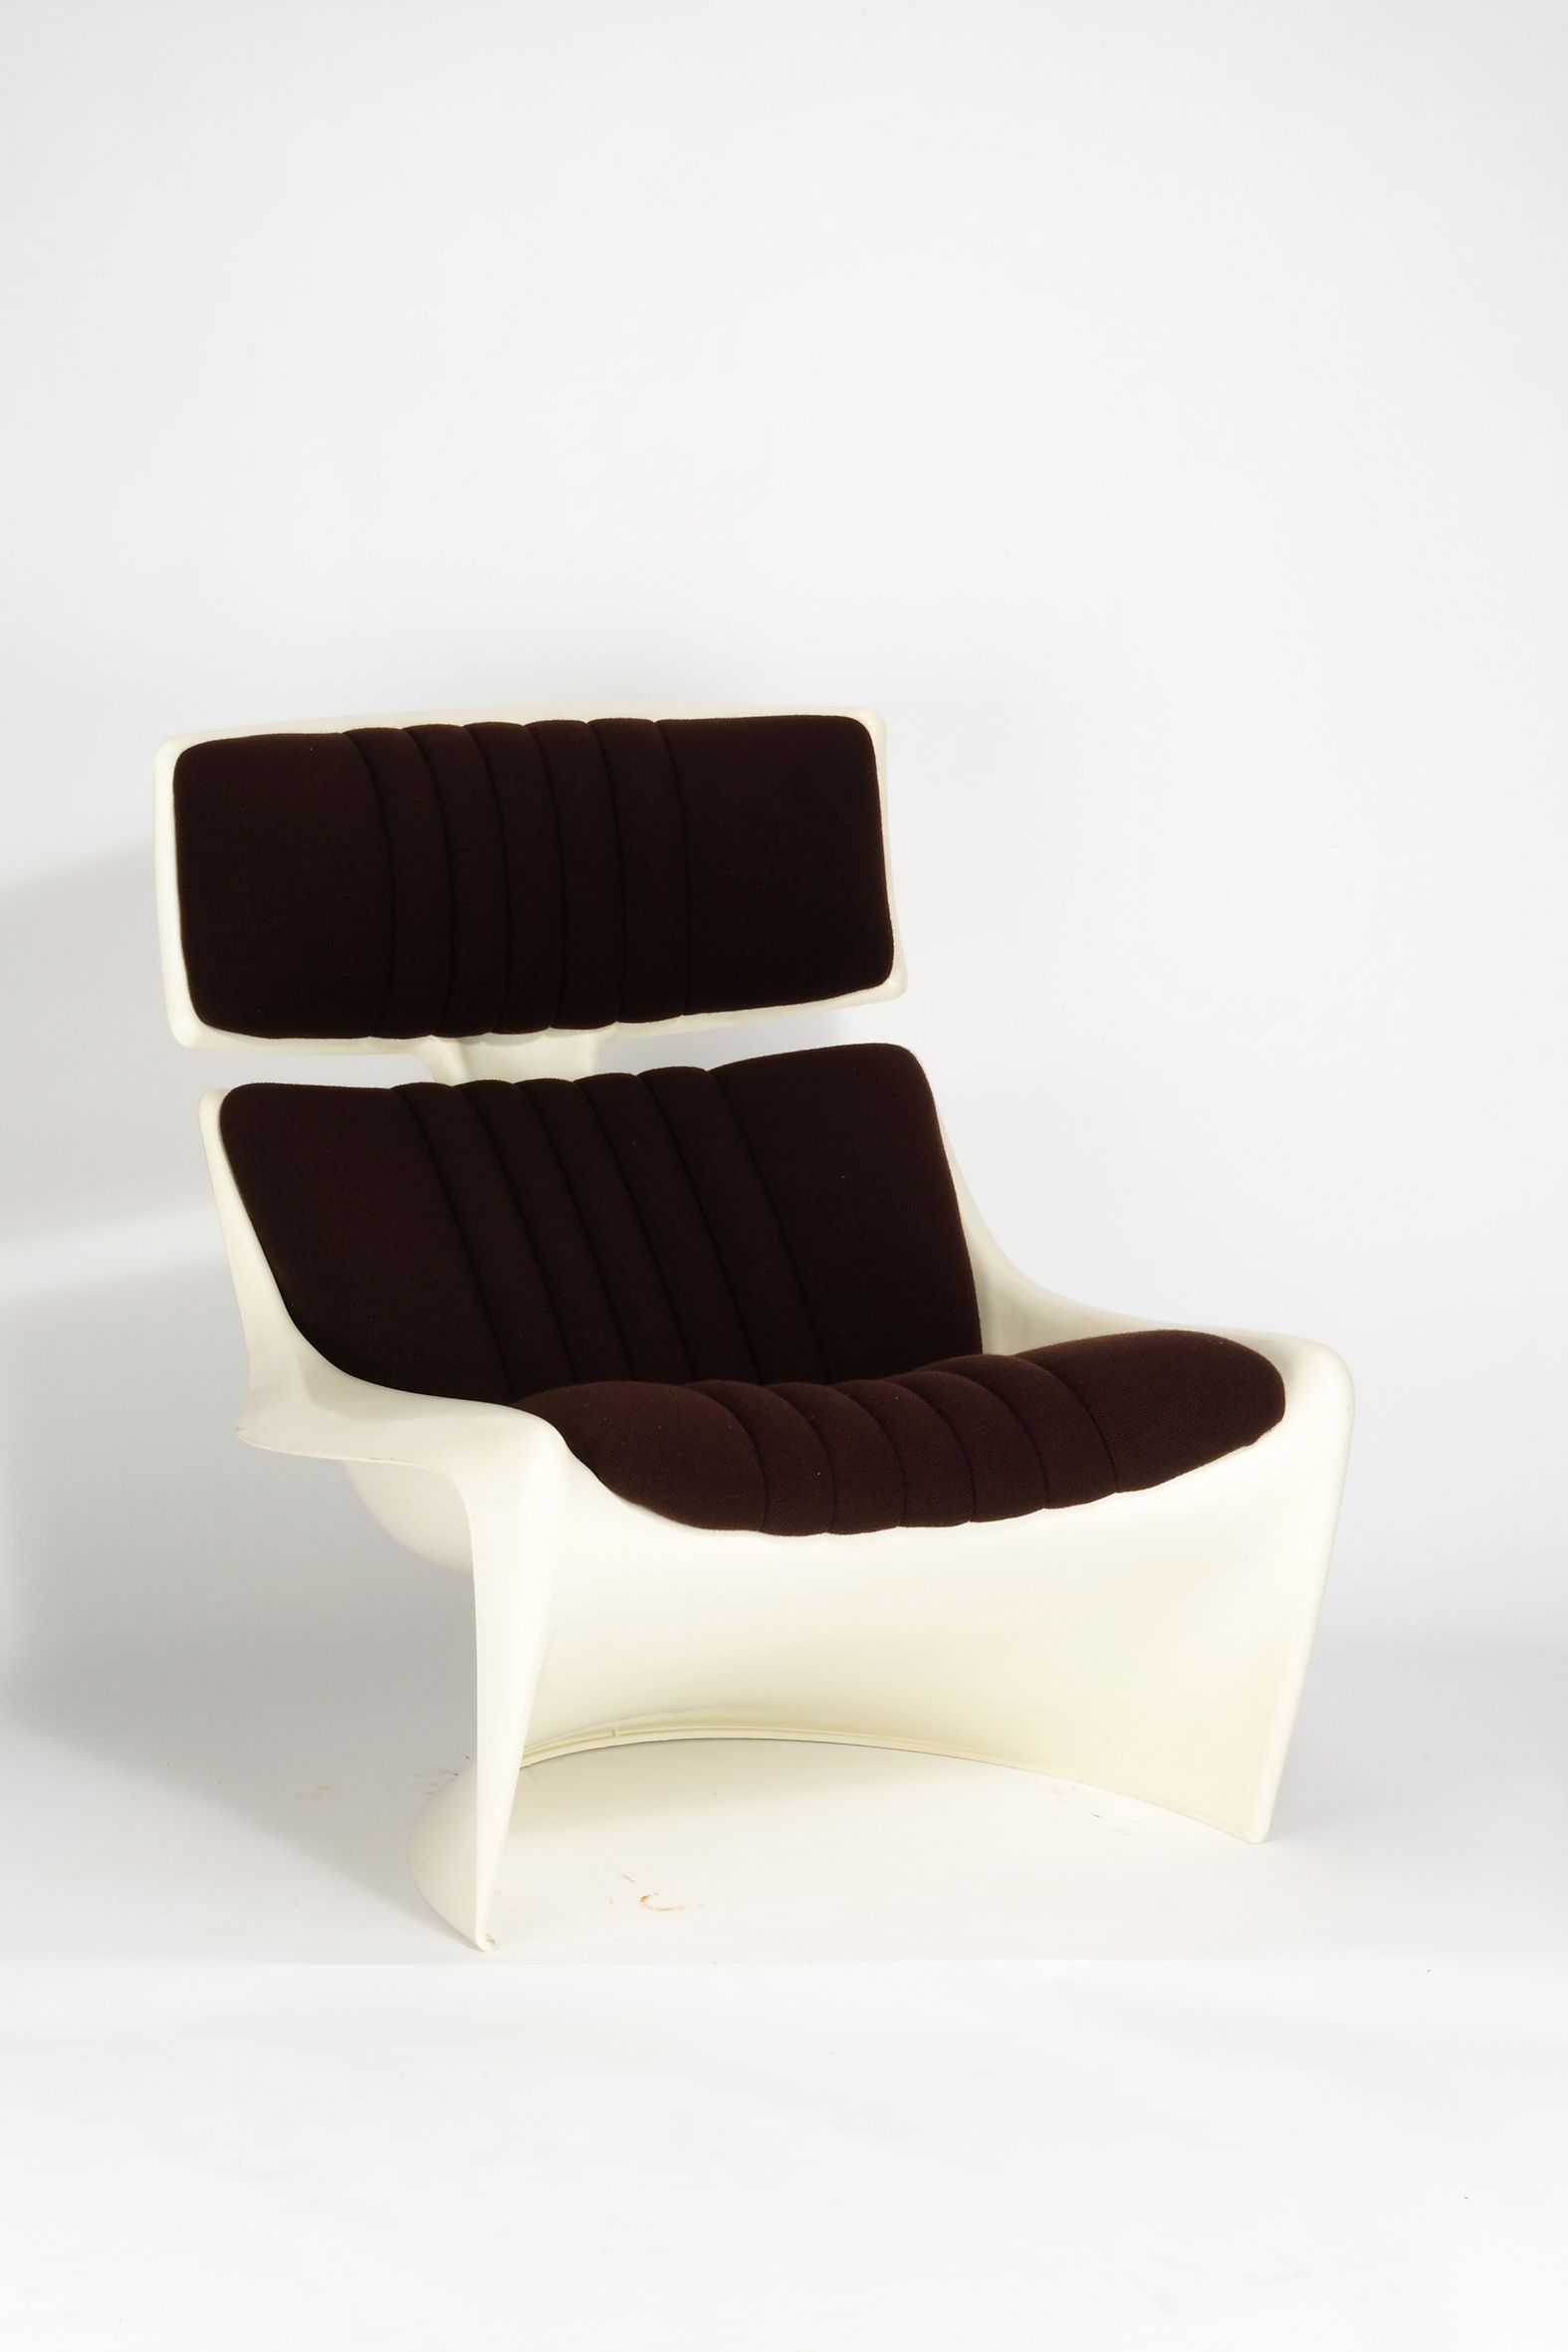 Steen Ostergaard; #265 A-Line Chair for Cado, 1970.